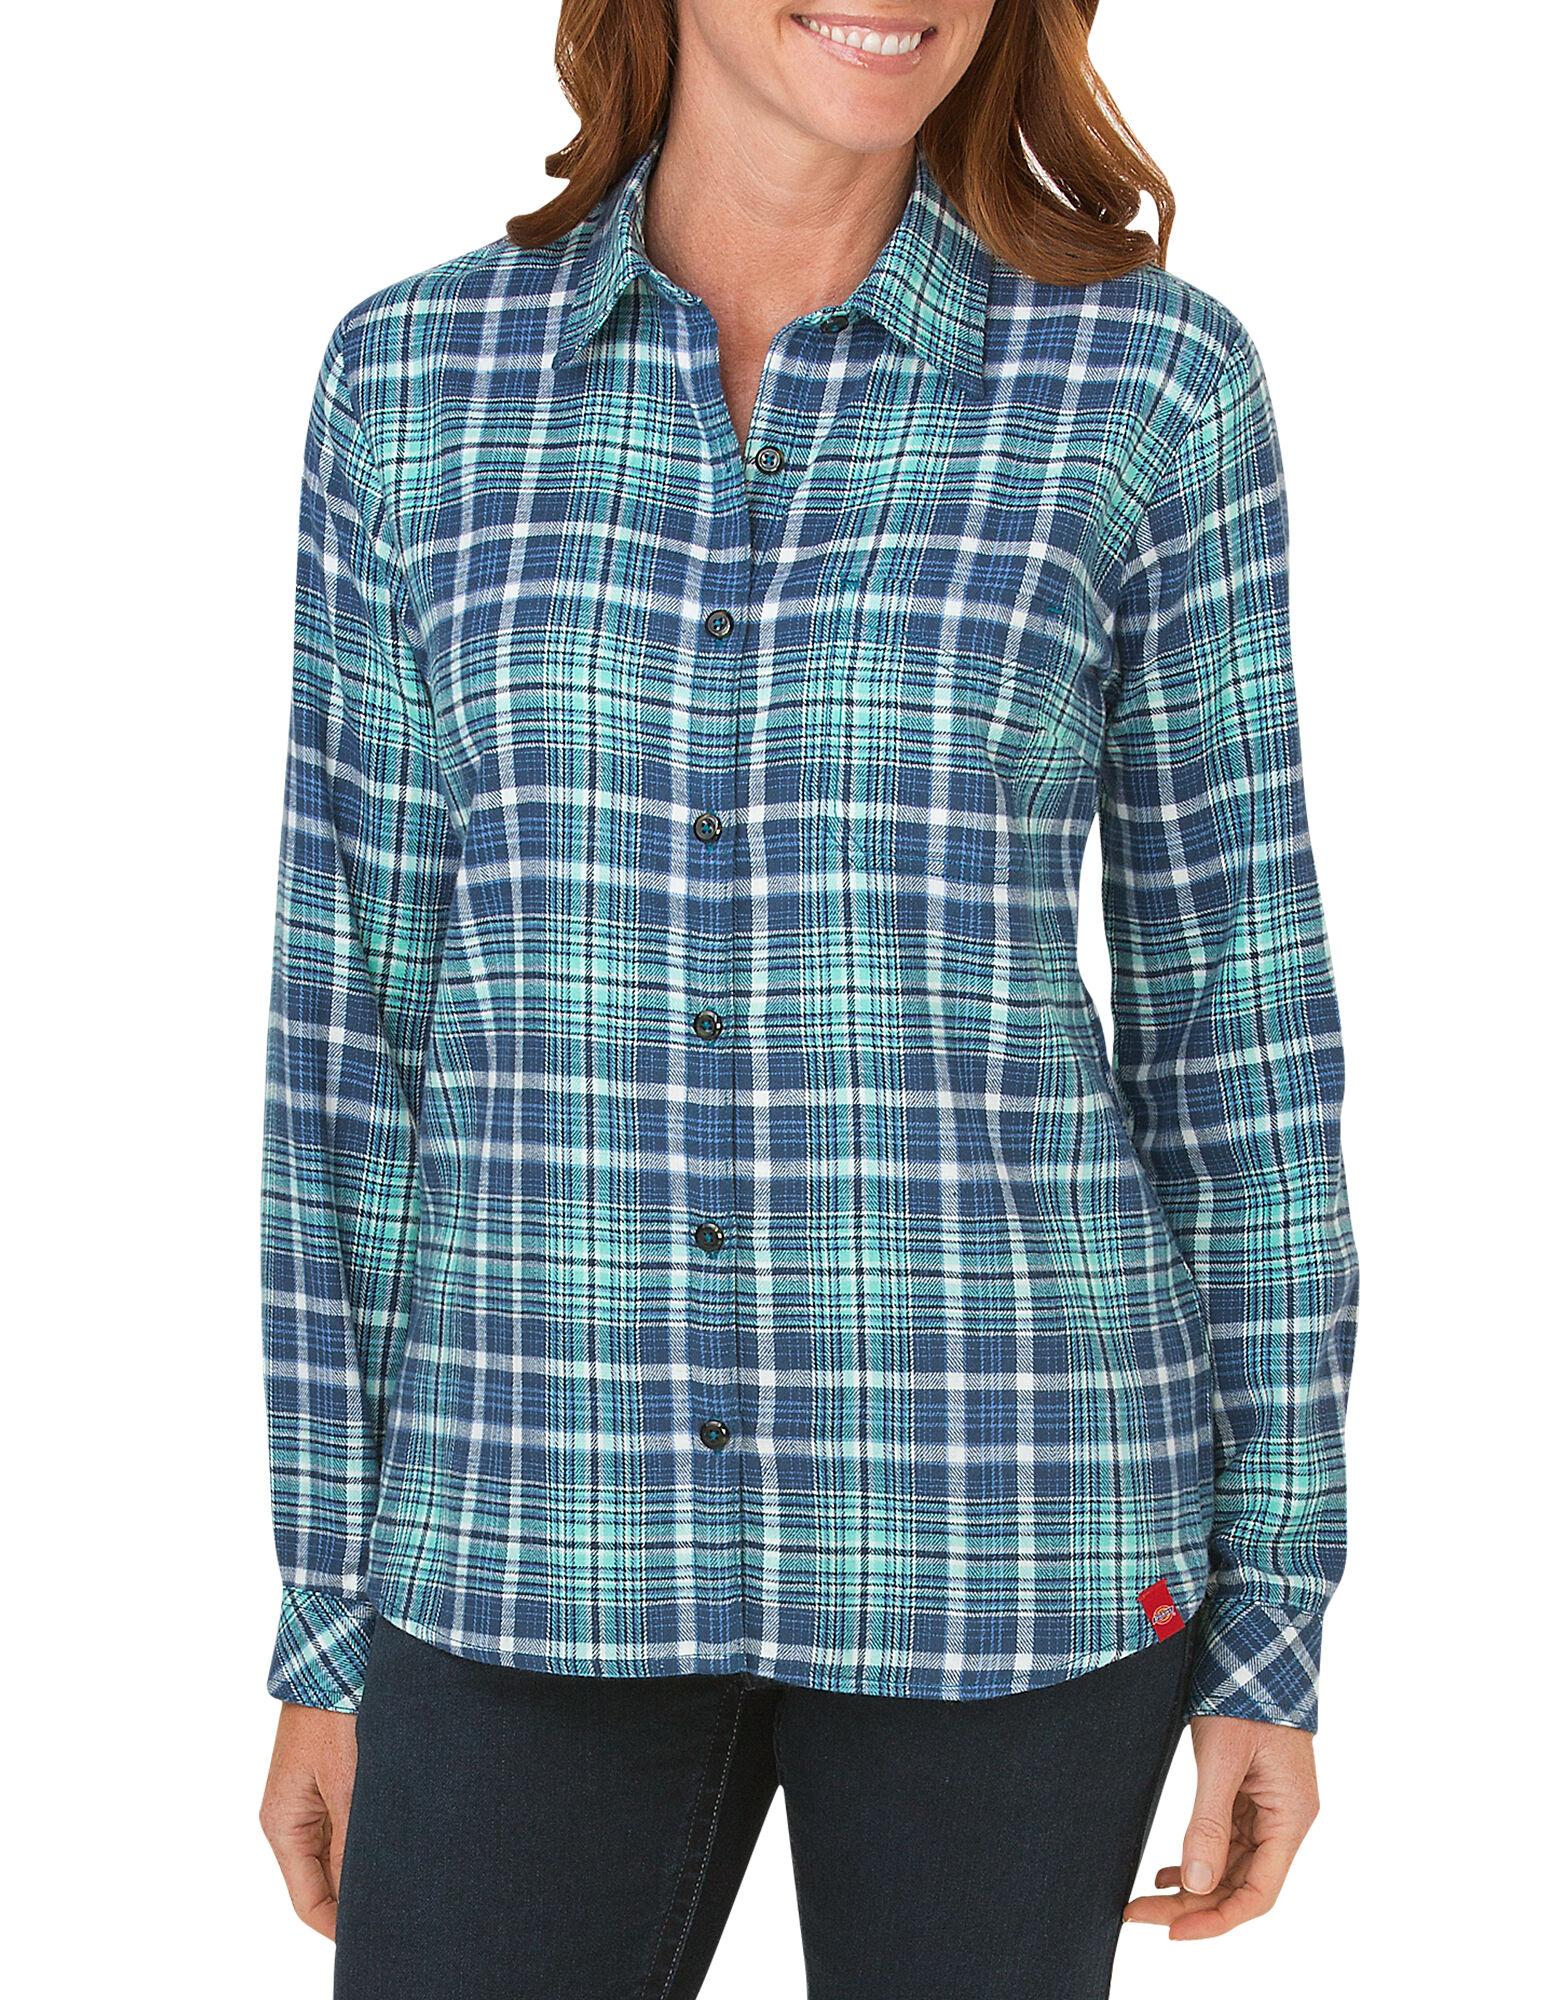 Women 39 s long sleeve plaid shirt dickies for Long plaid flannel shirt